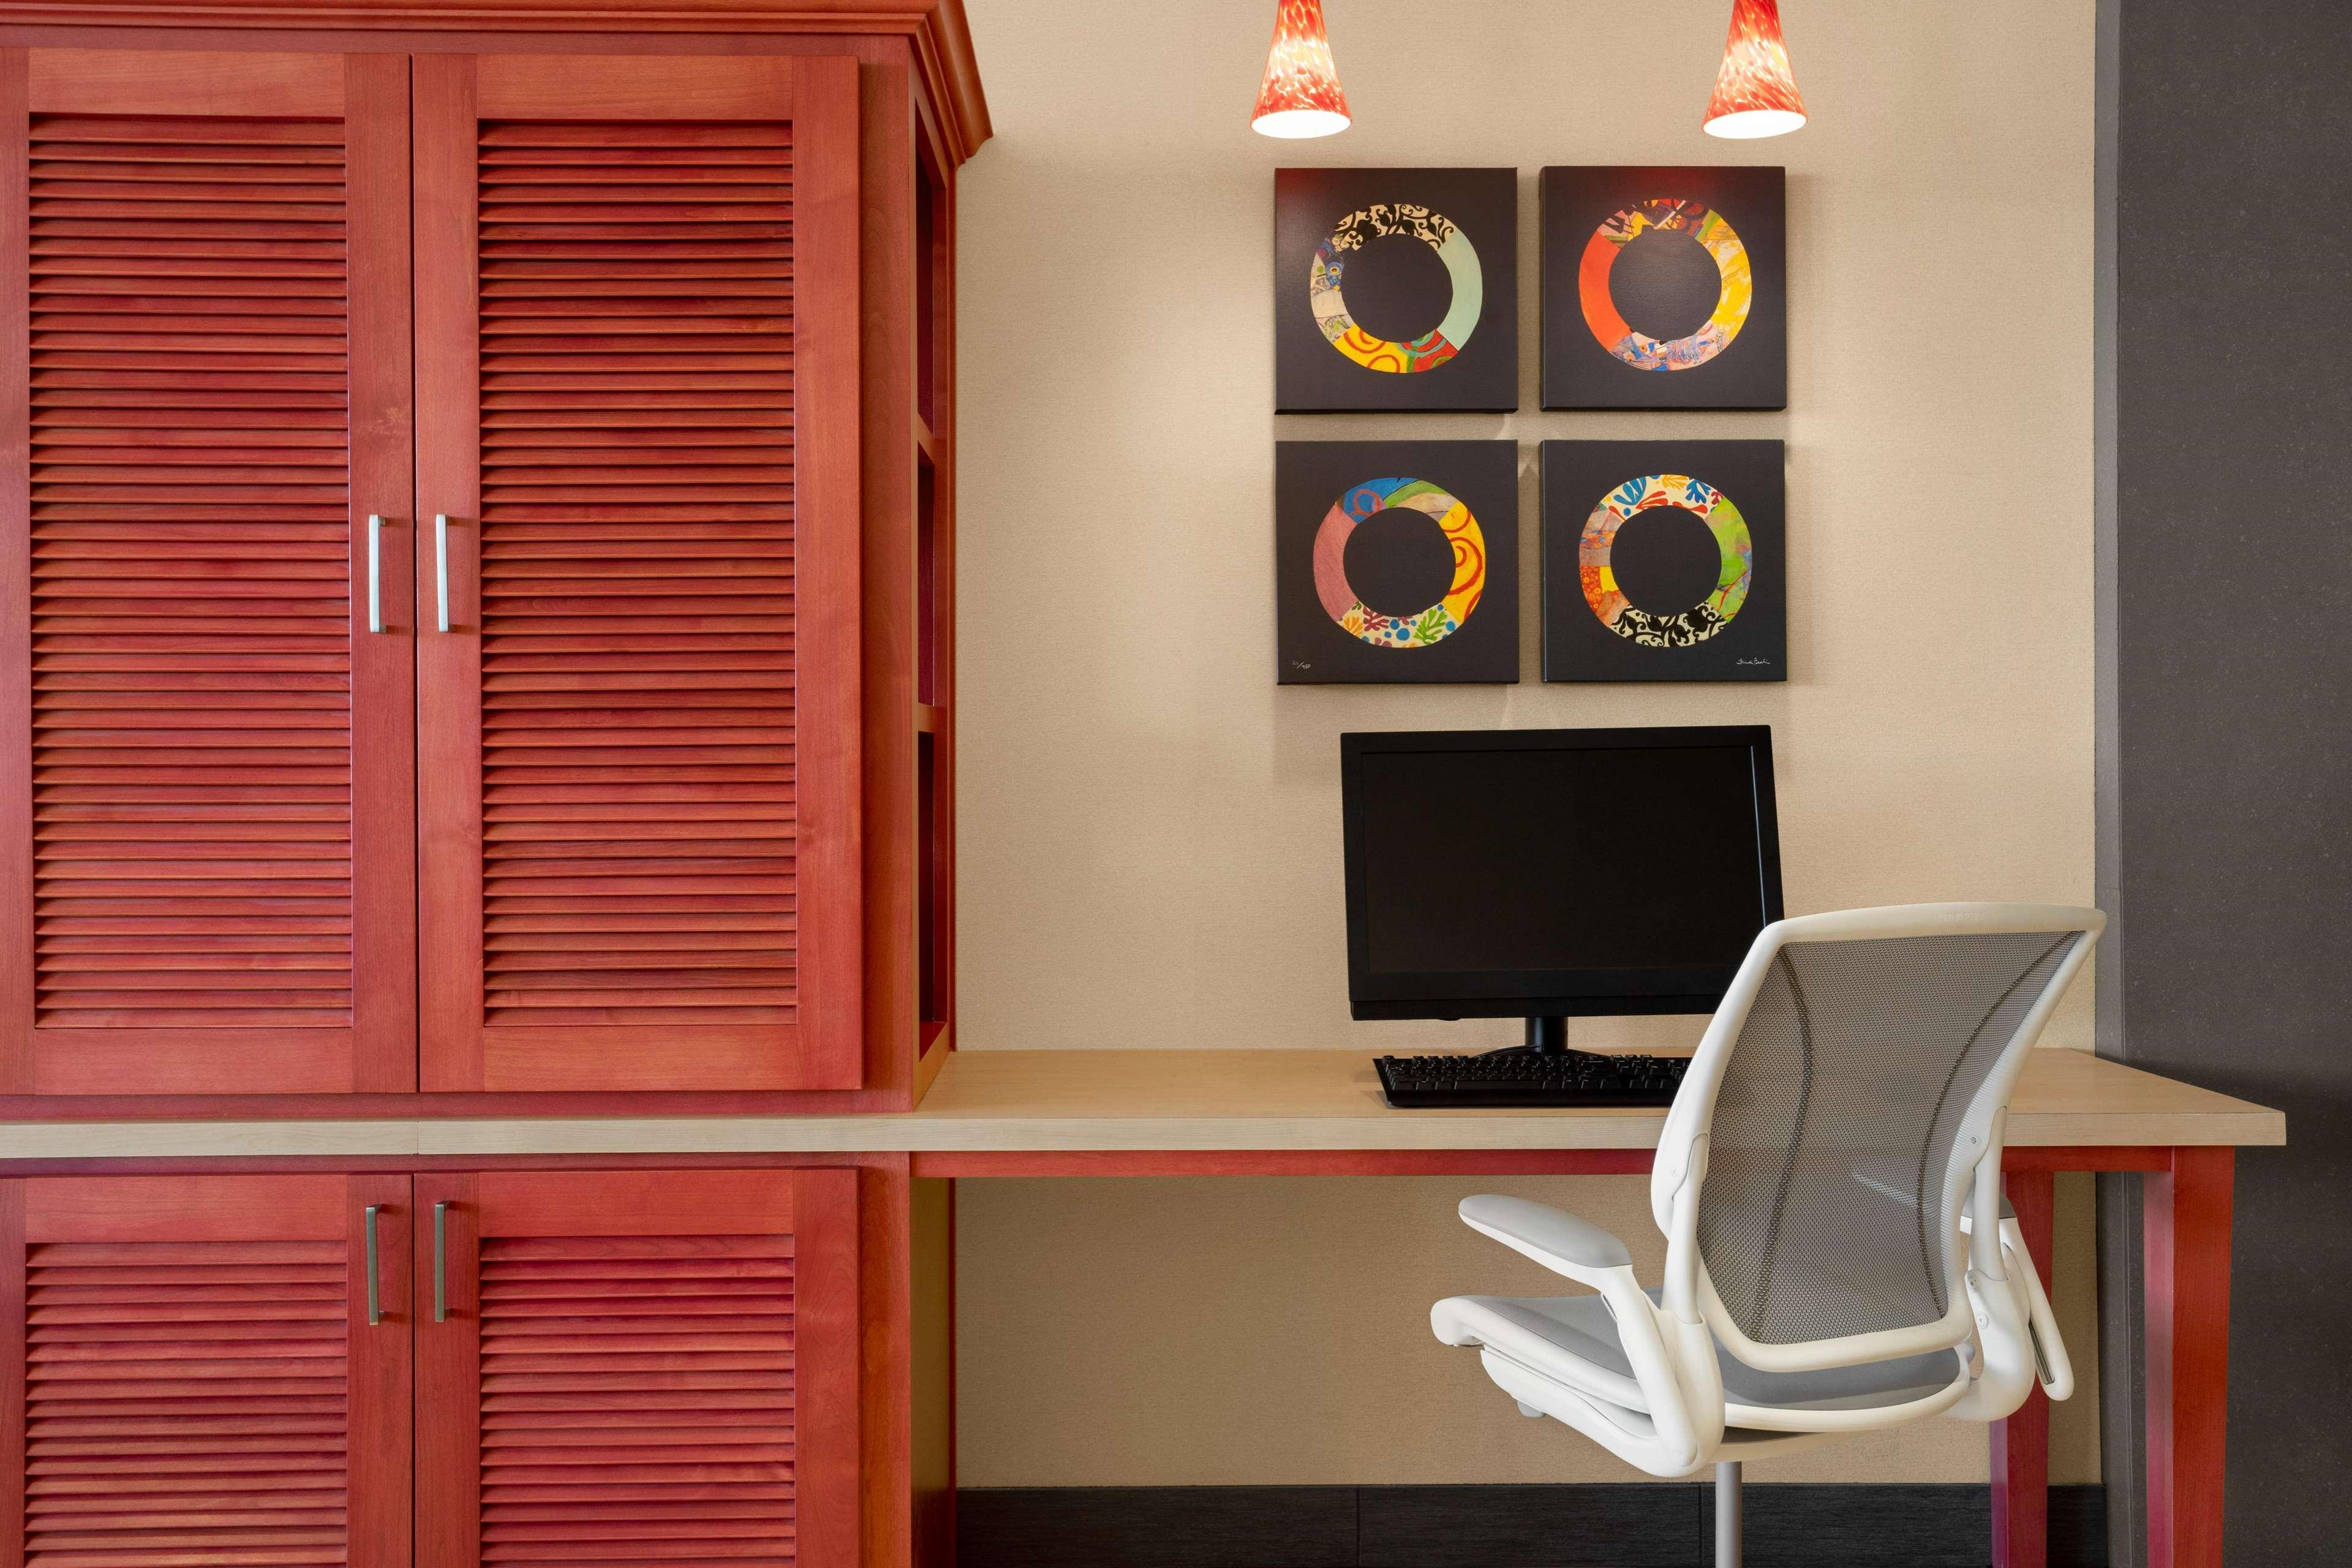 Home2 Suites by Hilton Elko image 32